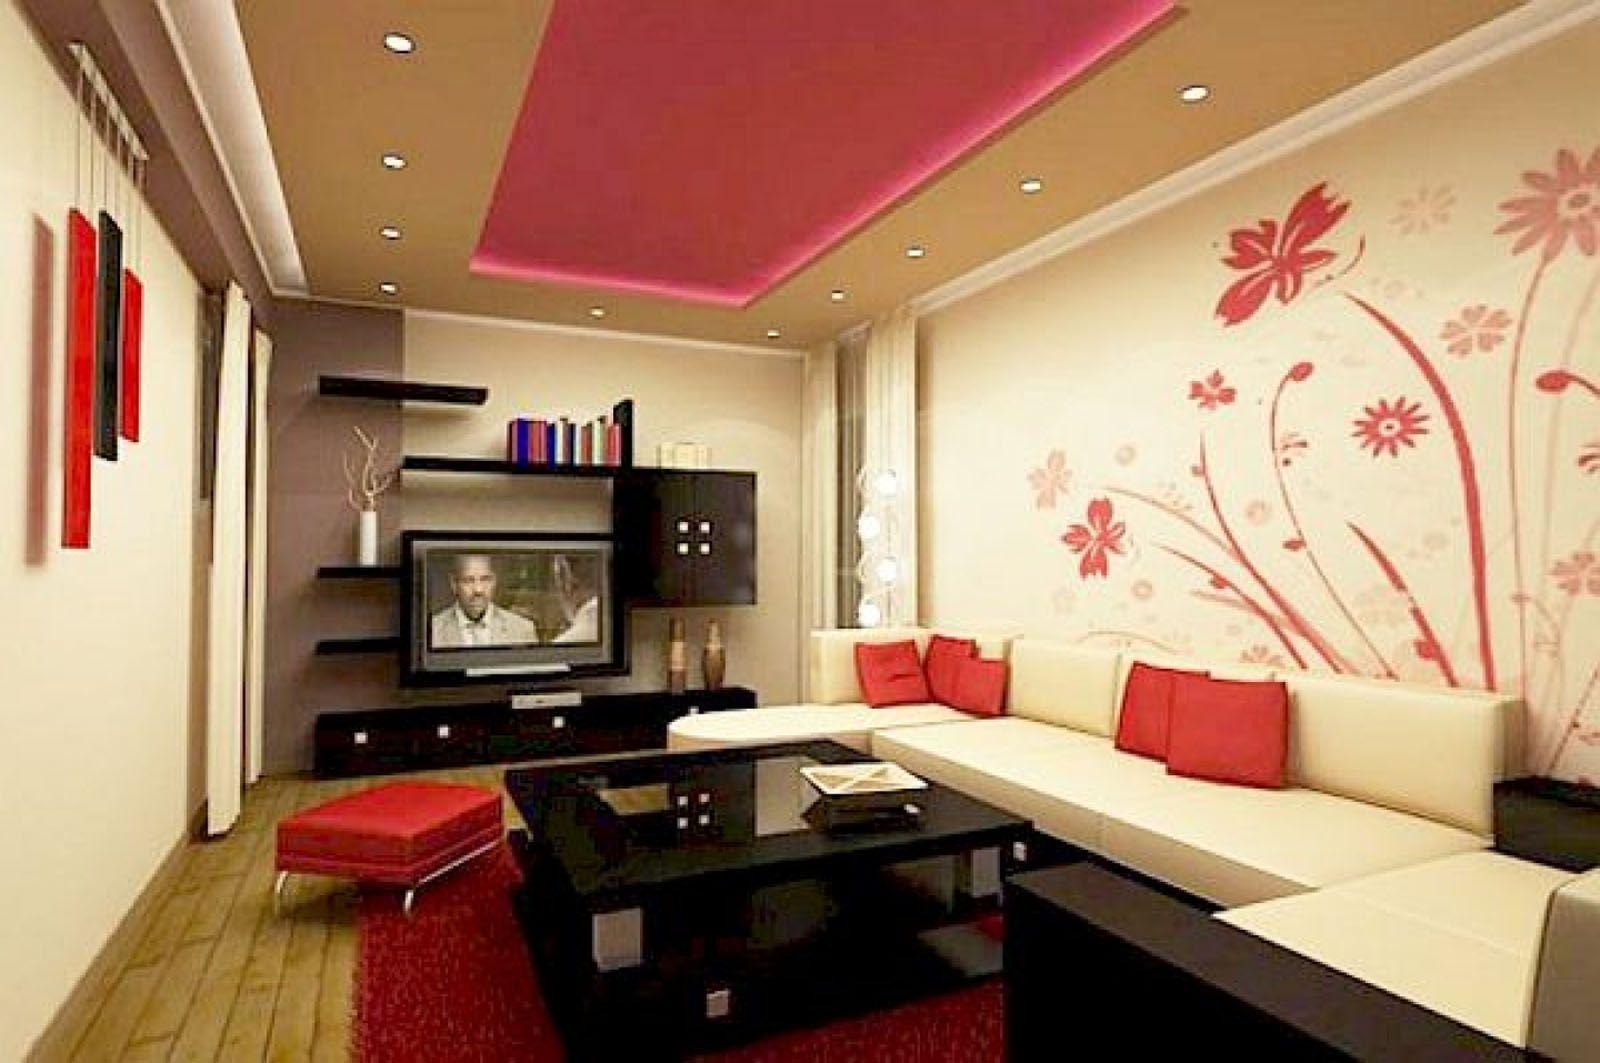 Paint Designs For Living Room Home Design Ideas Inside Paint Ideas